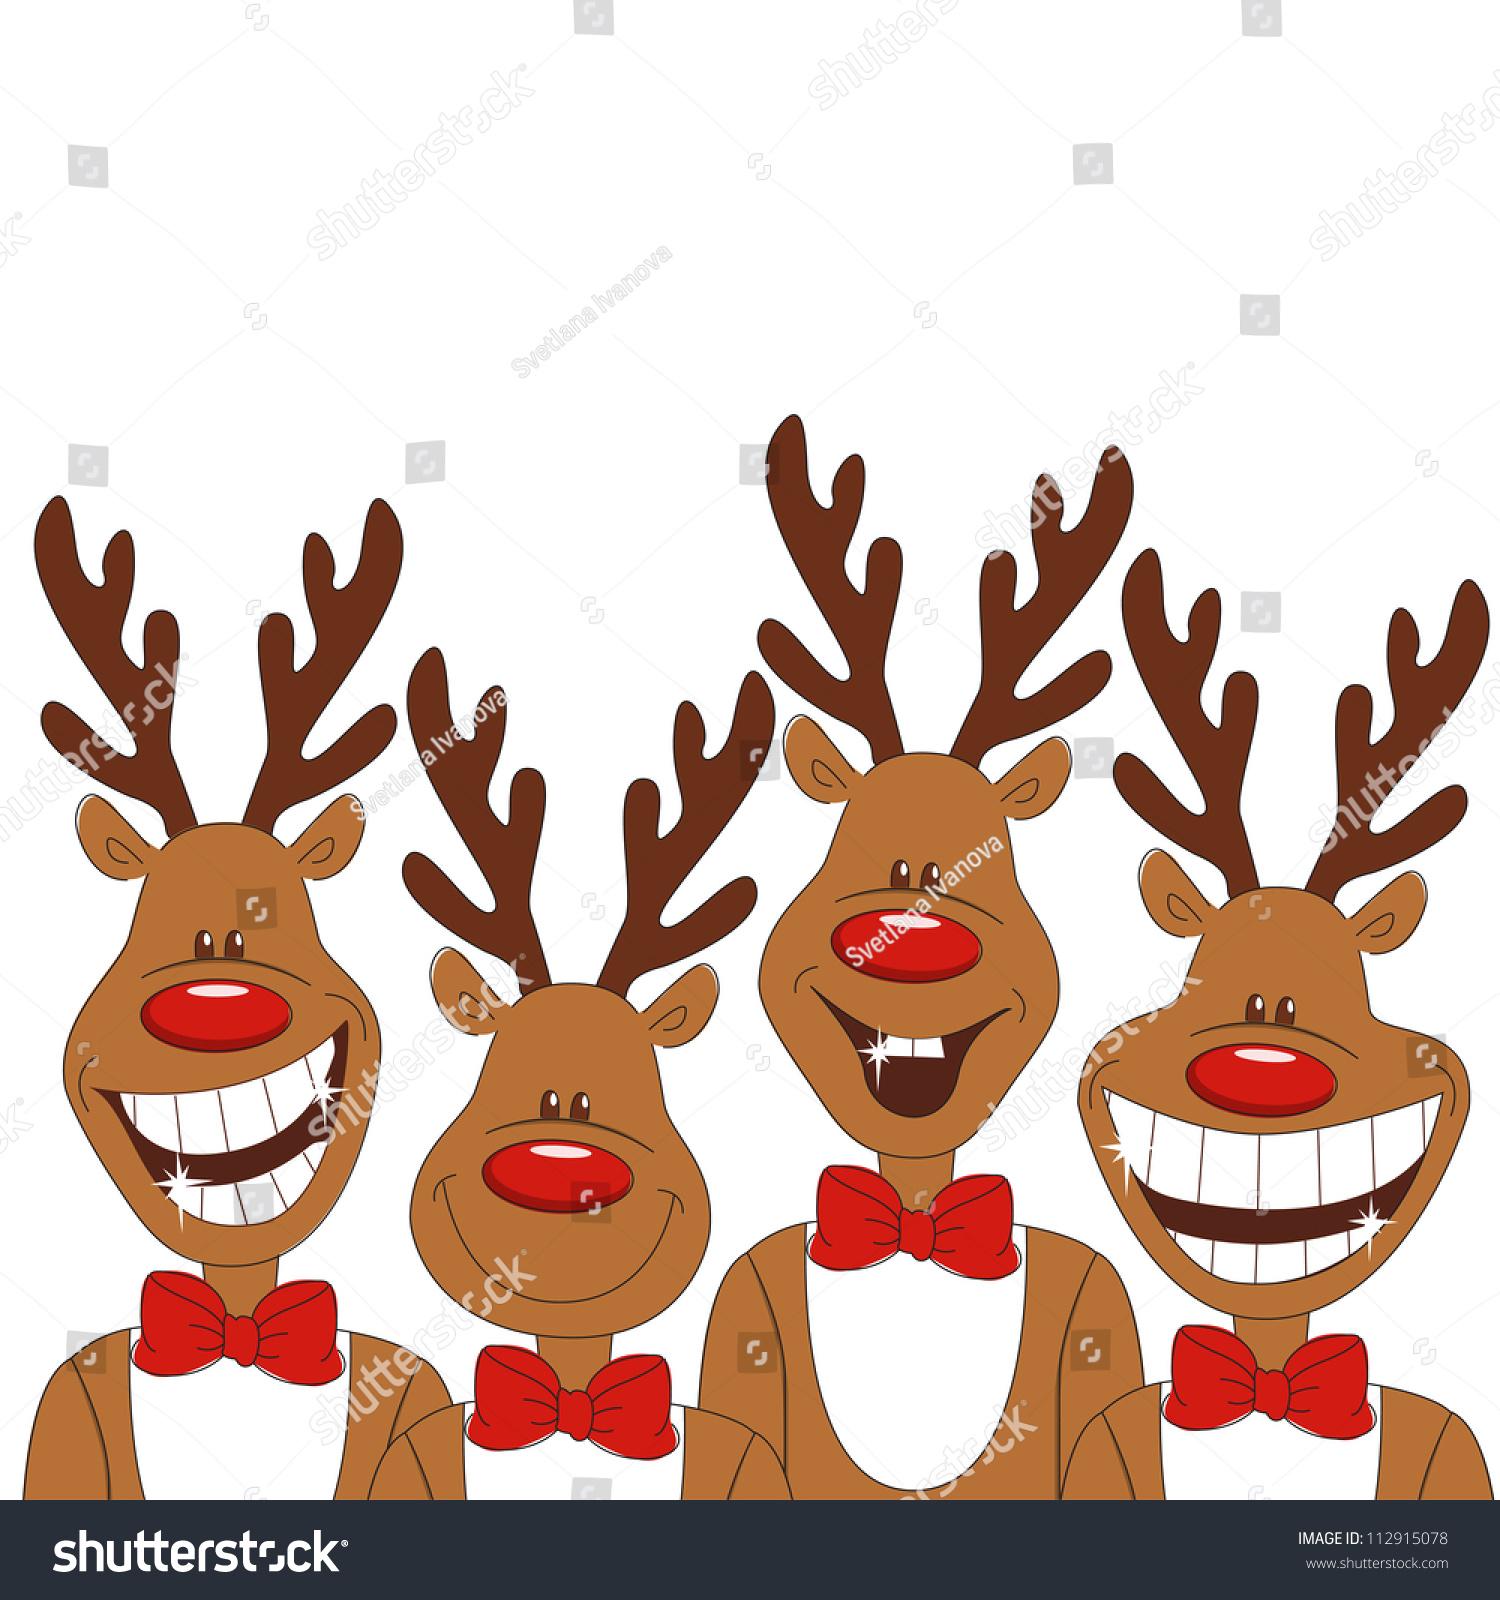 Christmas Illustration Cartoon Reindeer Vector Stock ...